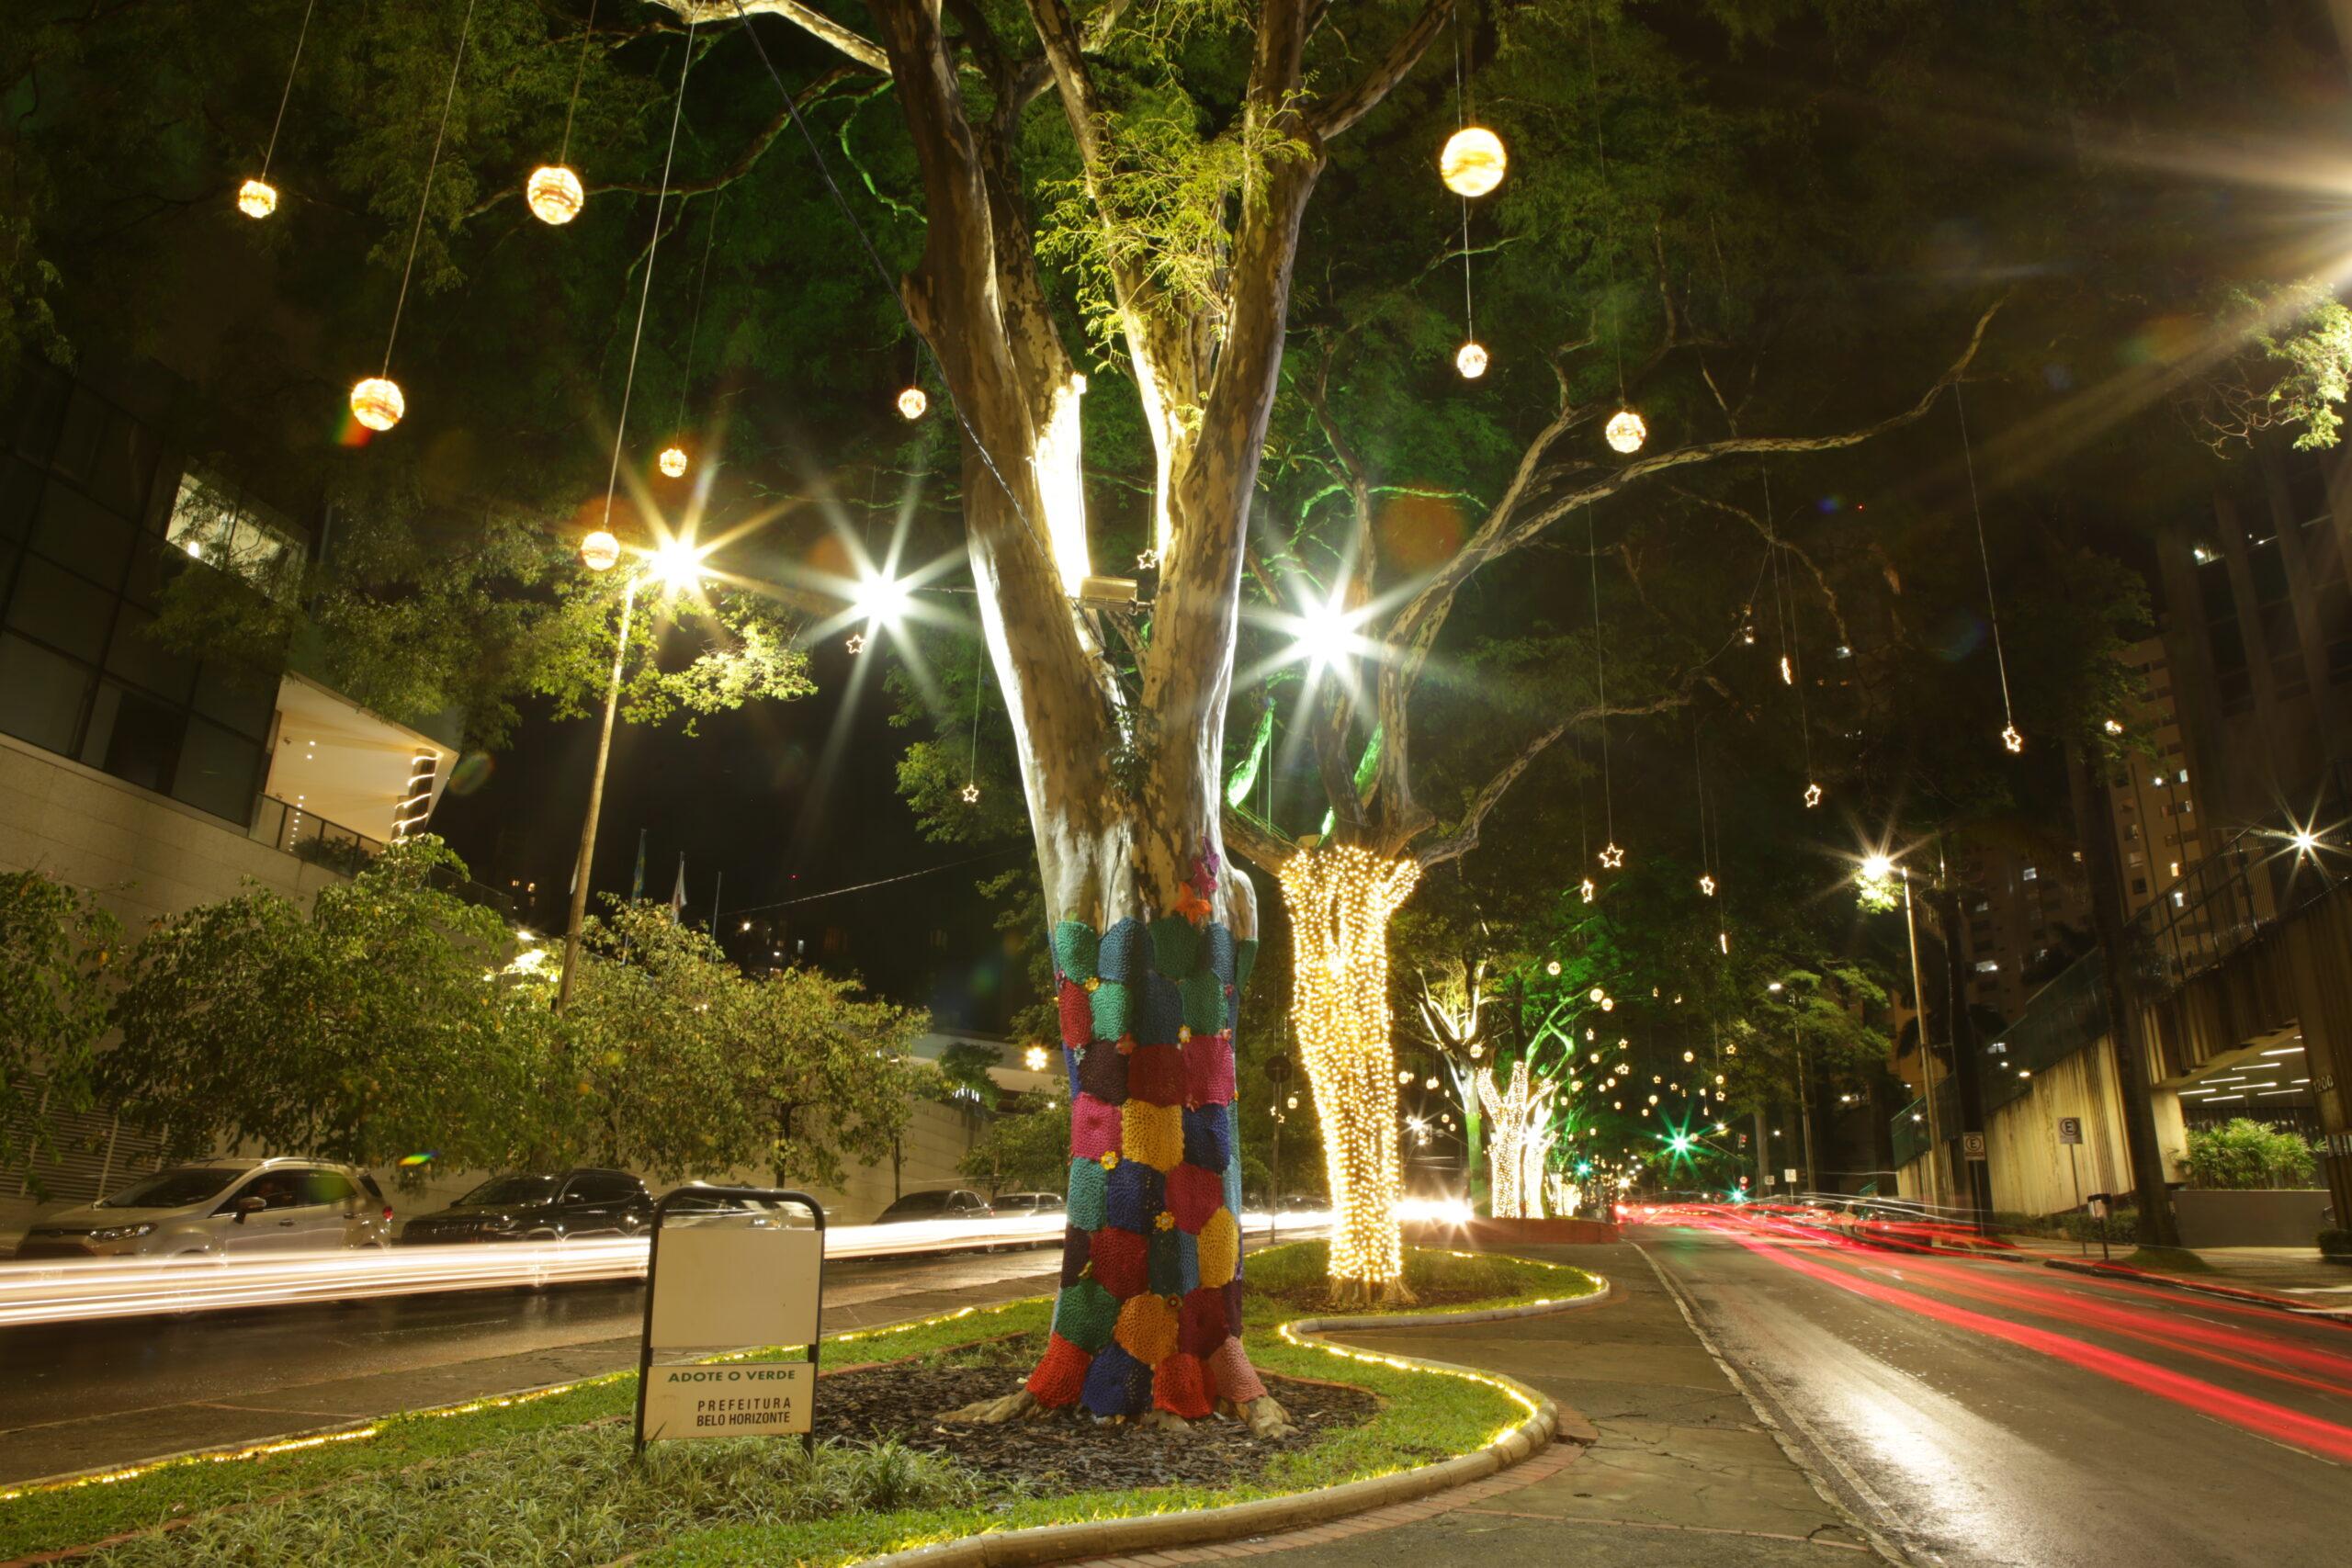 Confira as fotos do natal de luzes Cemig